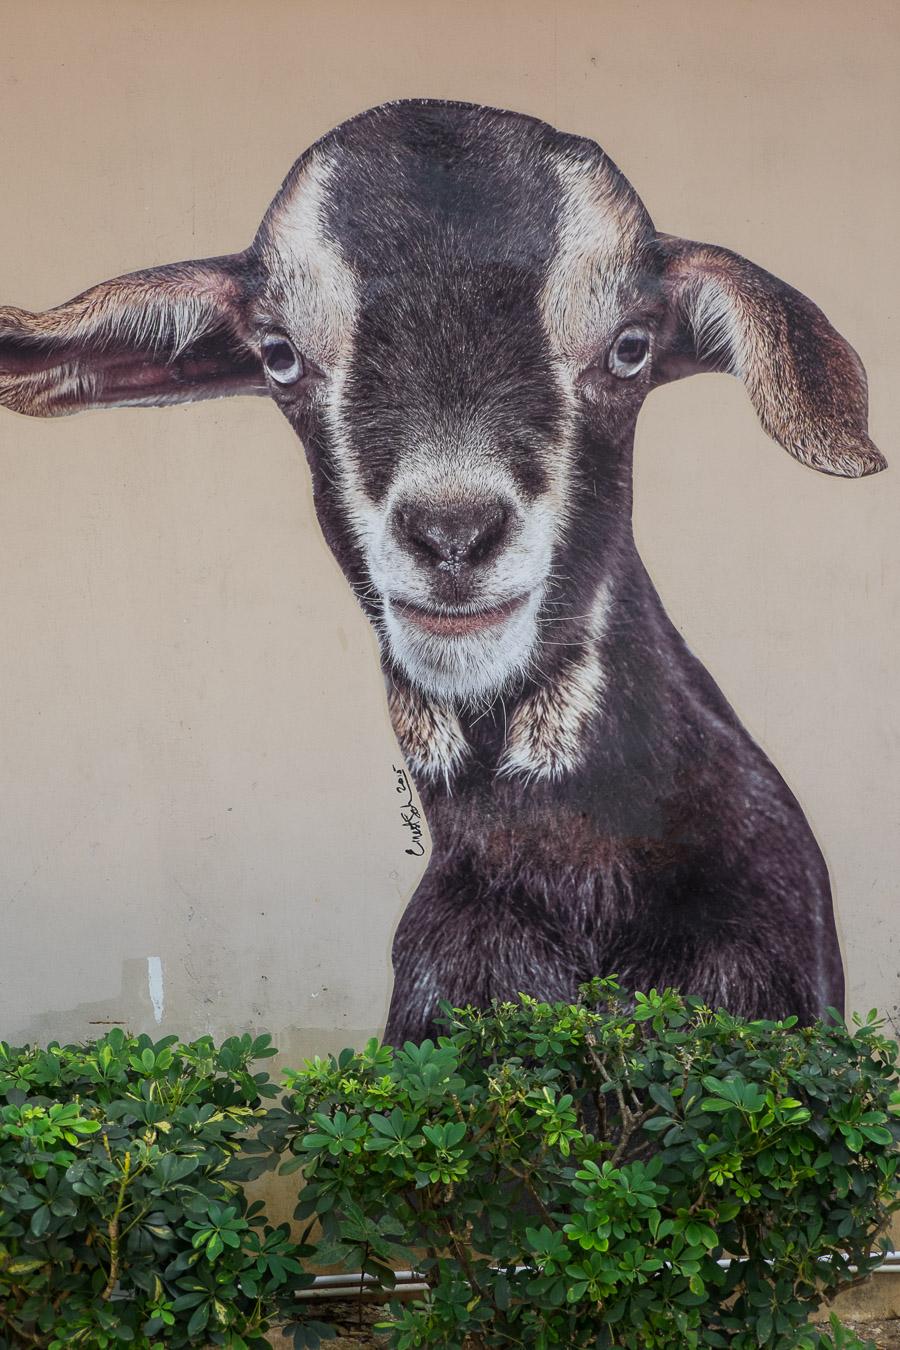 Goat mural